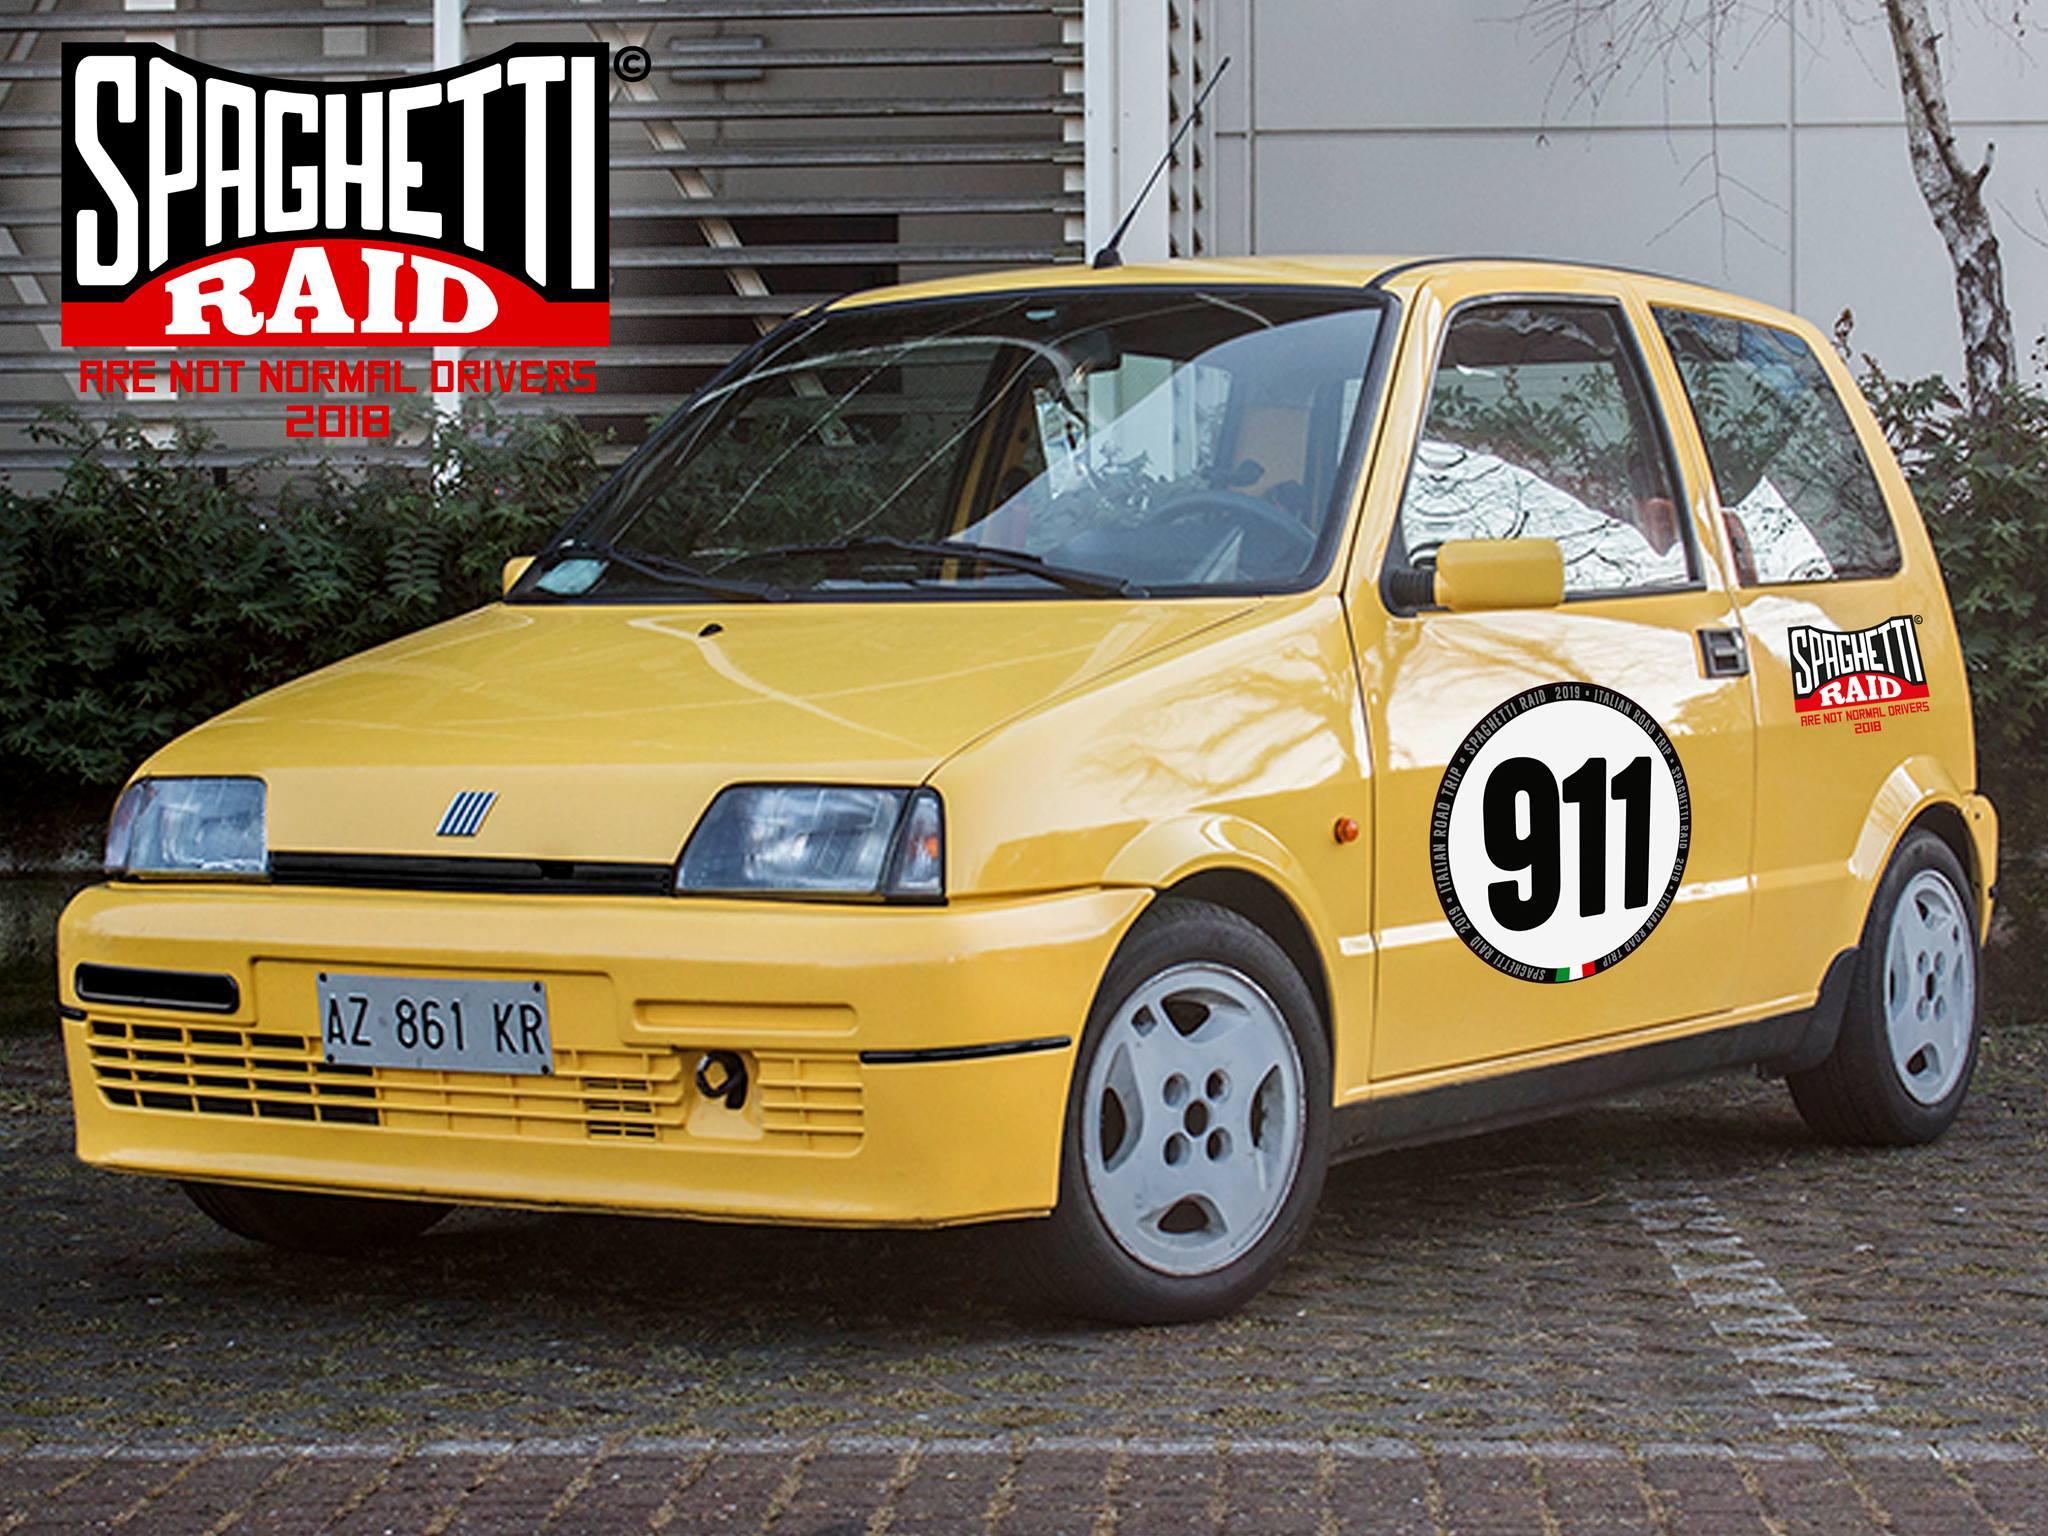 Team STRUNZ TRUPPEN #911 FIAT 500 SPORTING 1100cc del '98 Città: Cremona